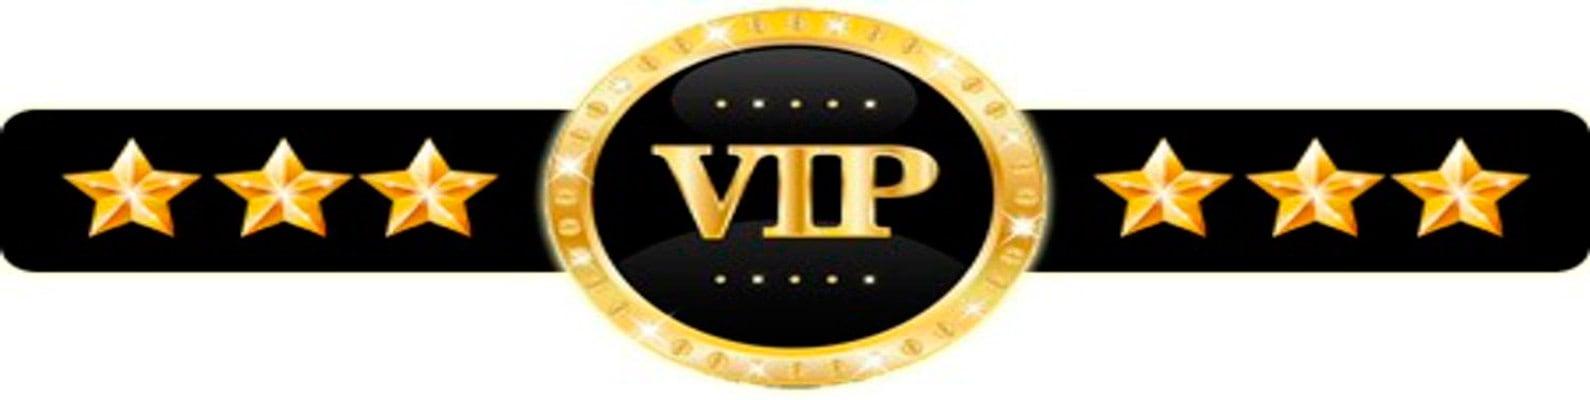 Кавер VIP